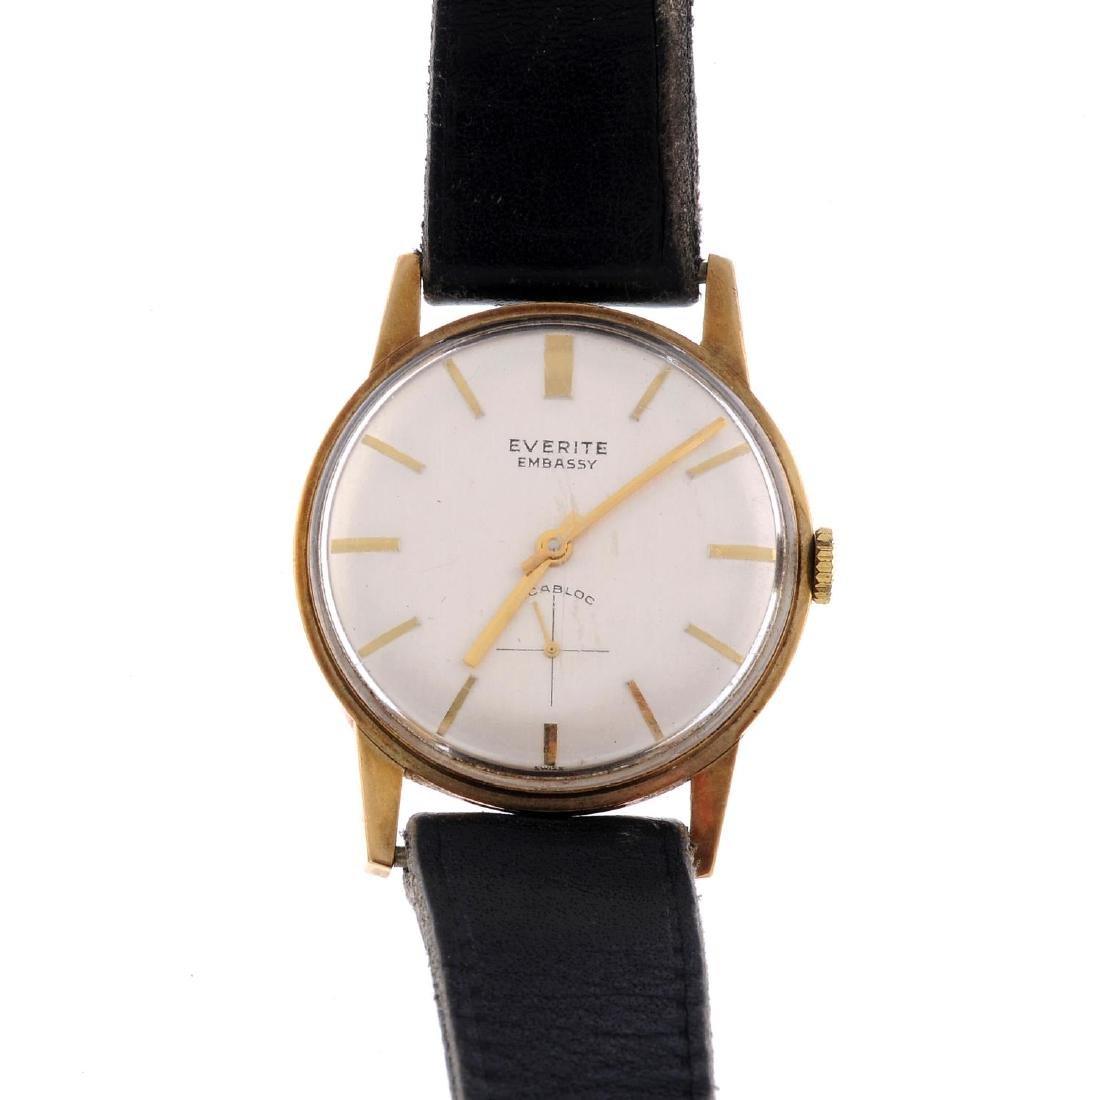 EVERITE - a gentleman's Embassy wrist watch. 9ct yellow